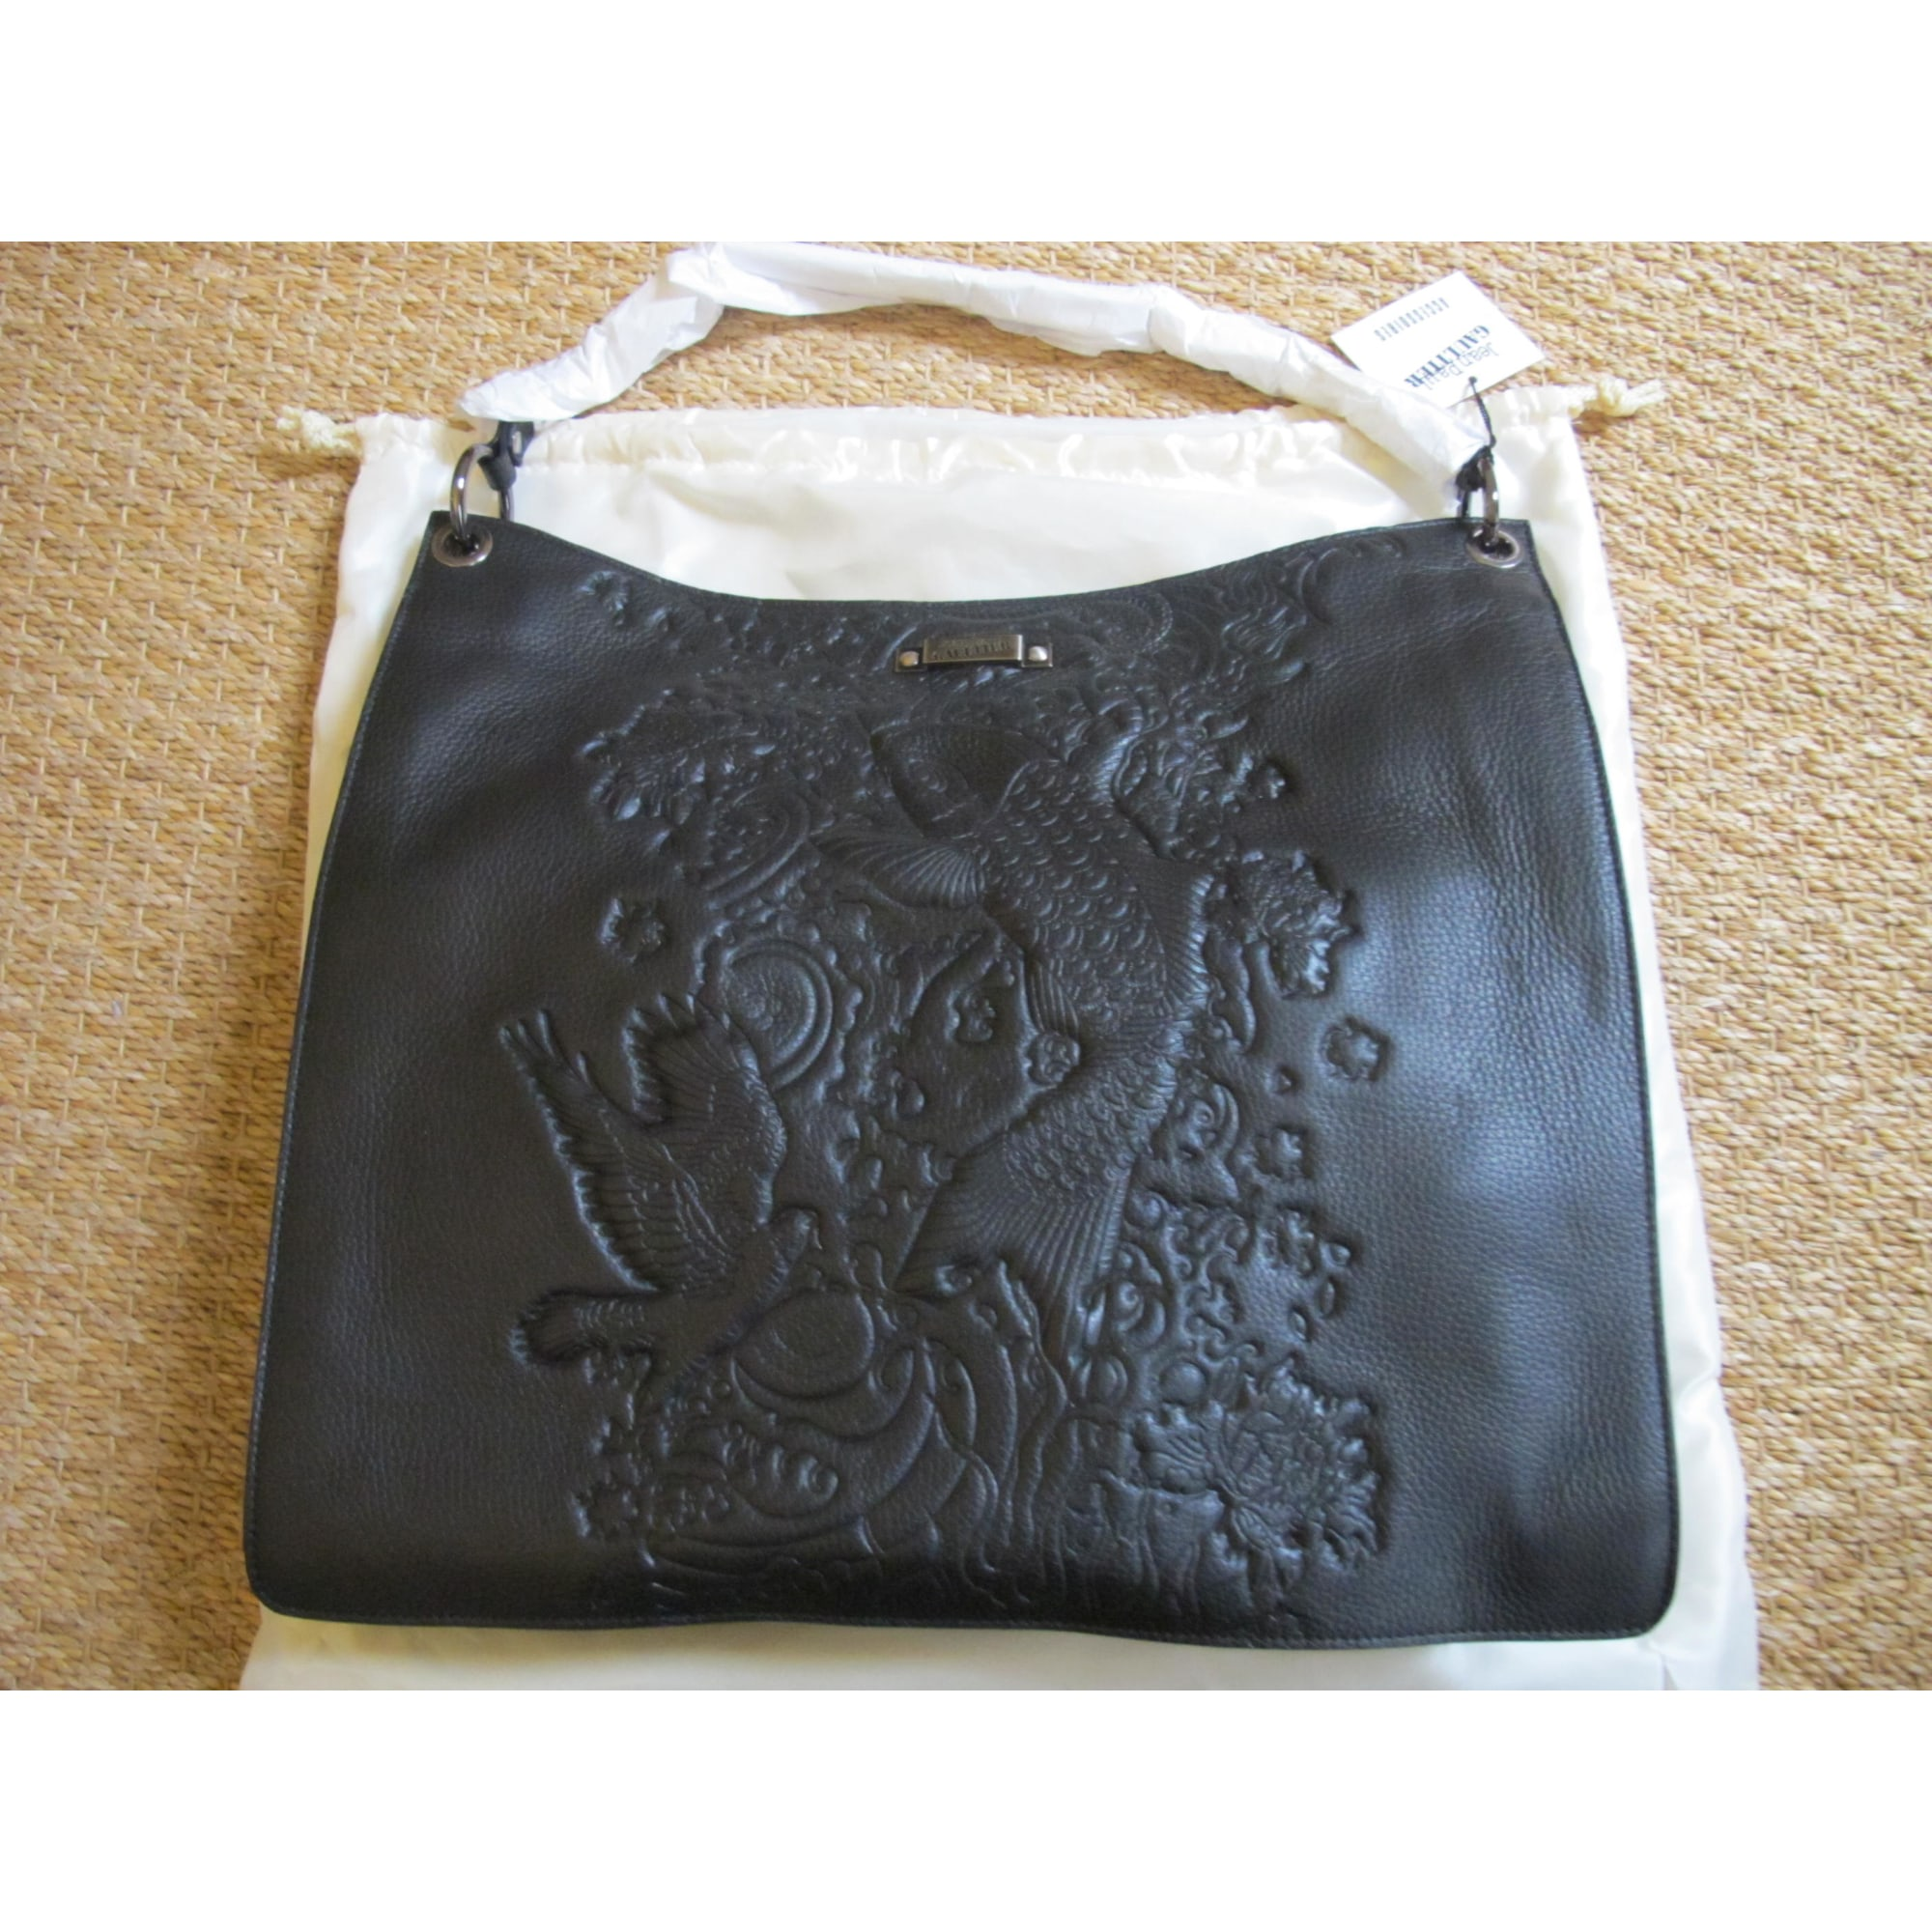 61cd02a1fa Sac à main en cuir JEAN PAUL GAULTIER noir vendu par Danae42 - 1076830